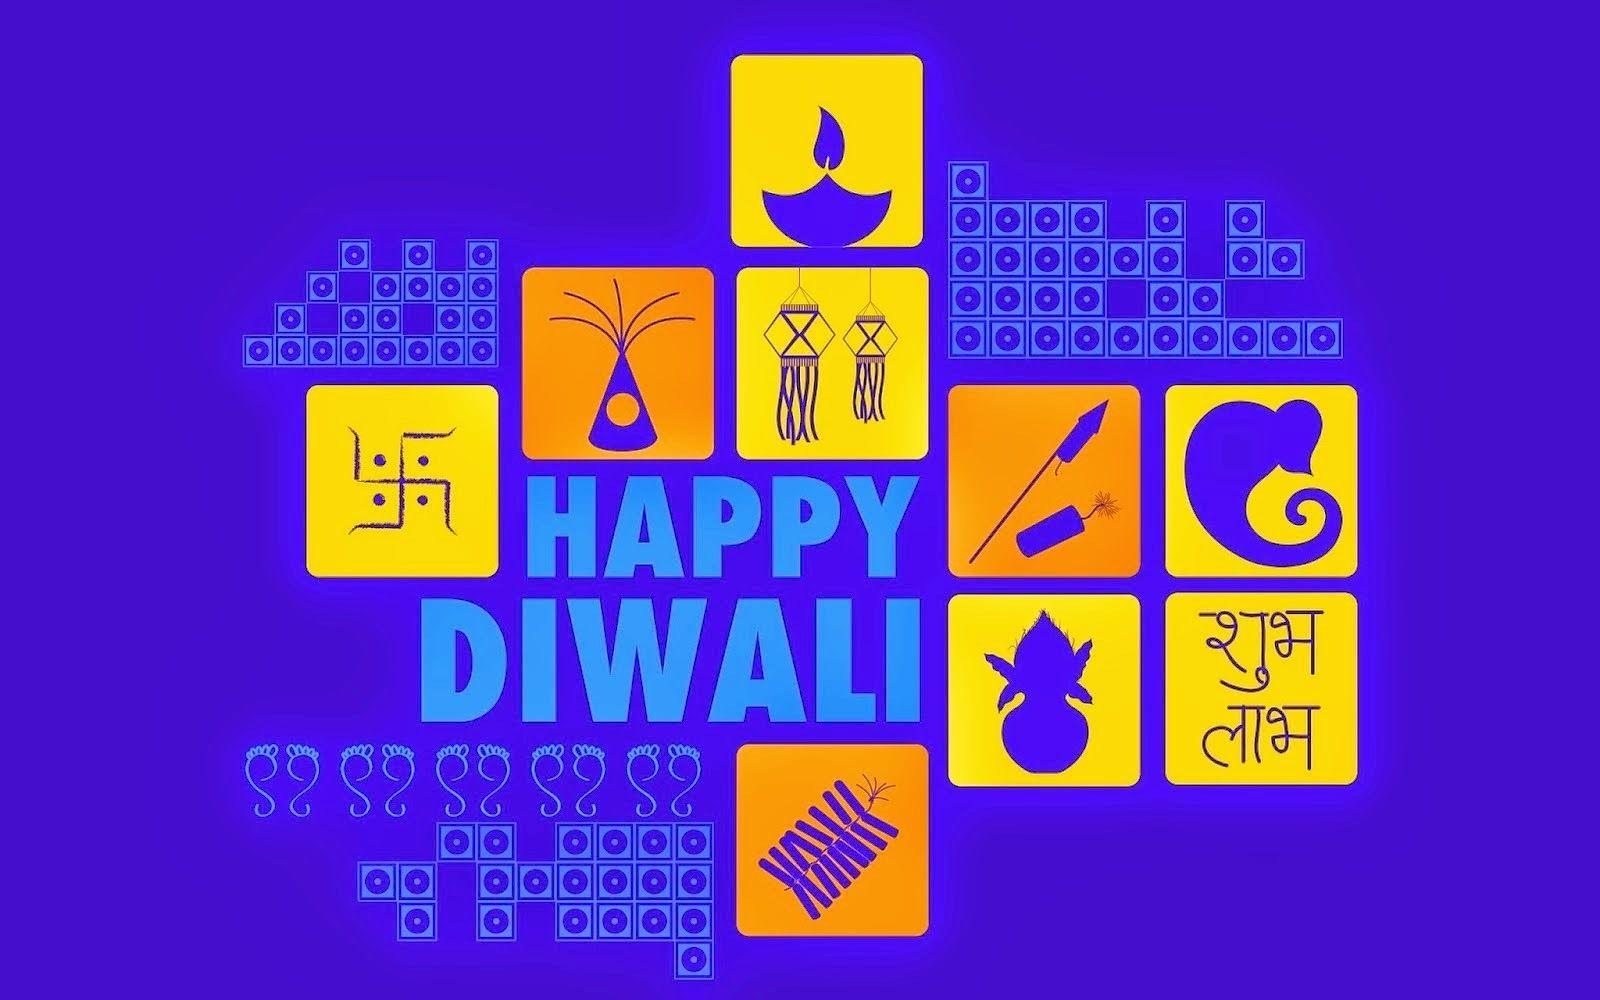 happy diwali images 2017 | diwali wallpapers hd | free deepawali images